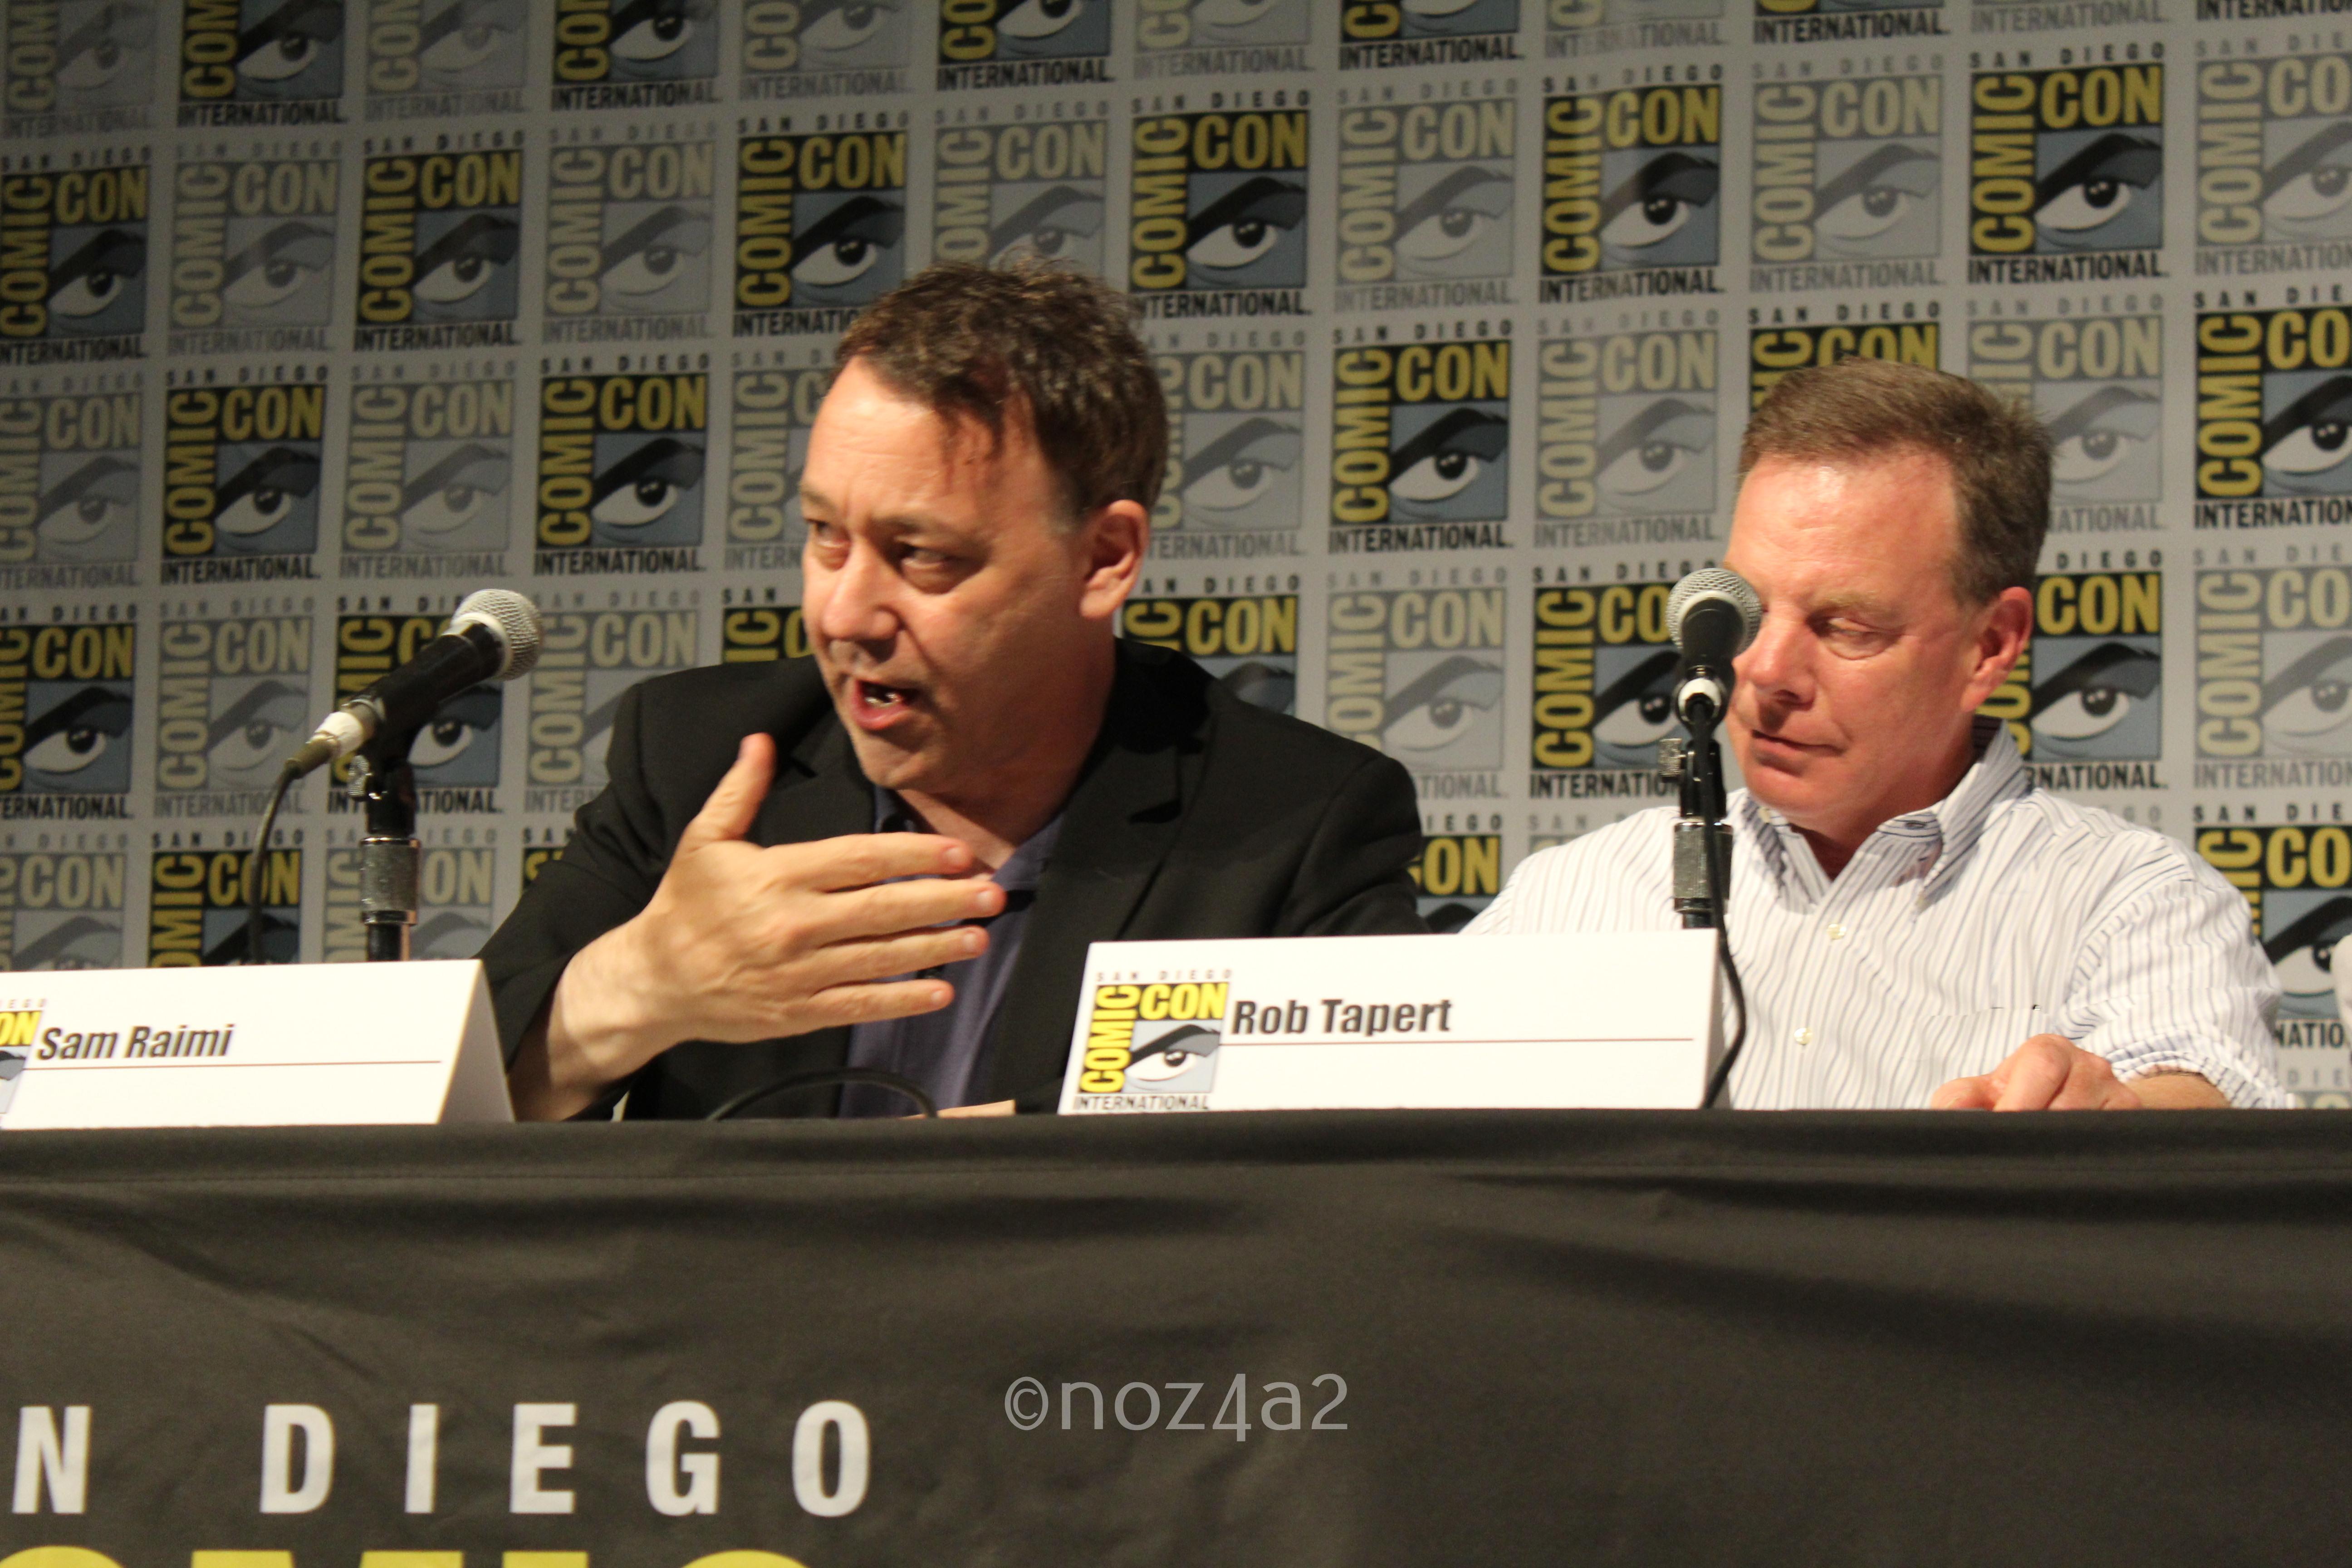 Sam Raimi & Rob Tapert